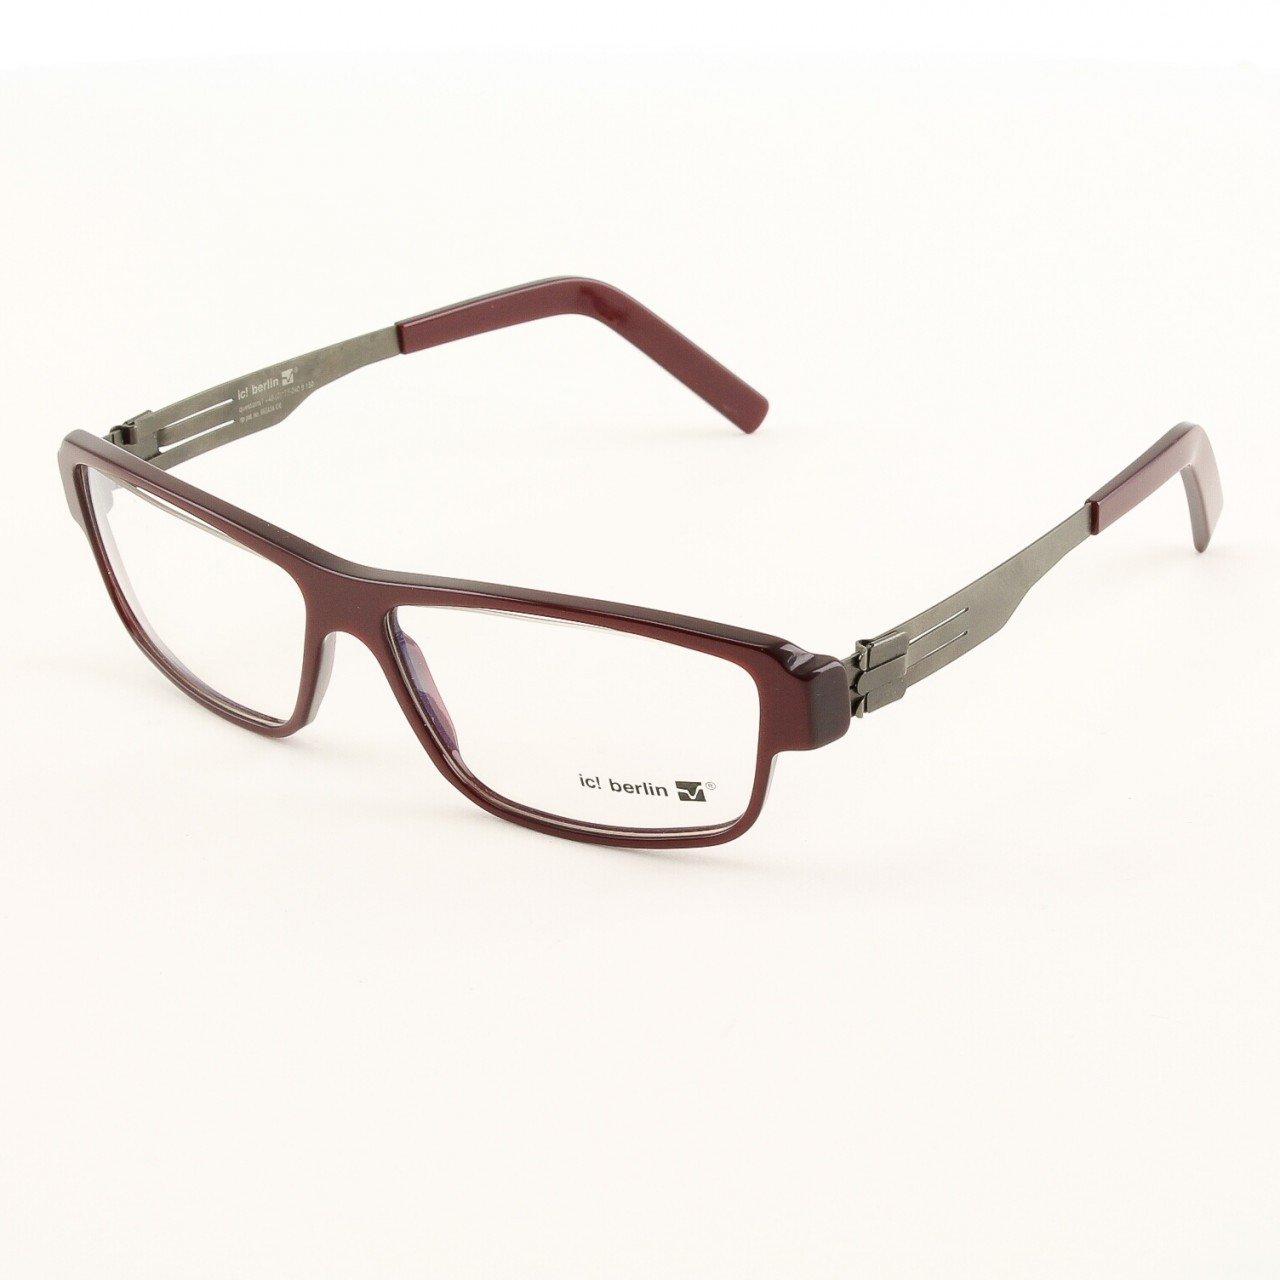 ic! Berlin Haytham Eyeglasses Col. Cherry with Clear Lenses